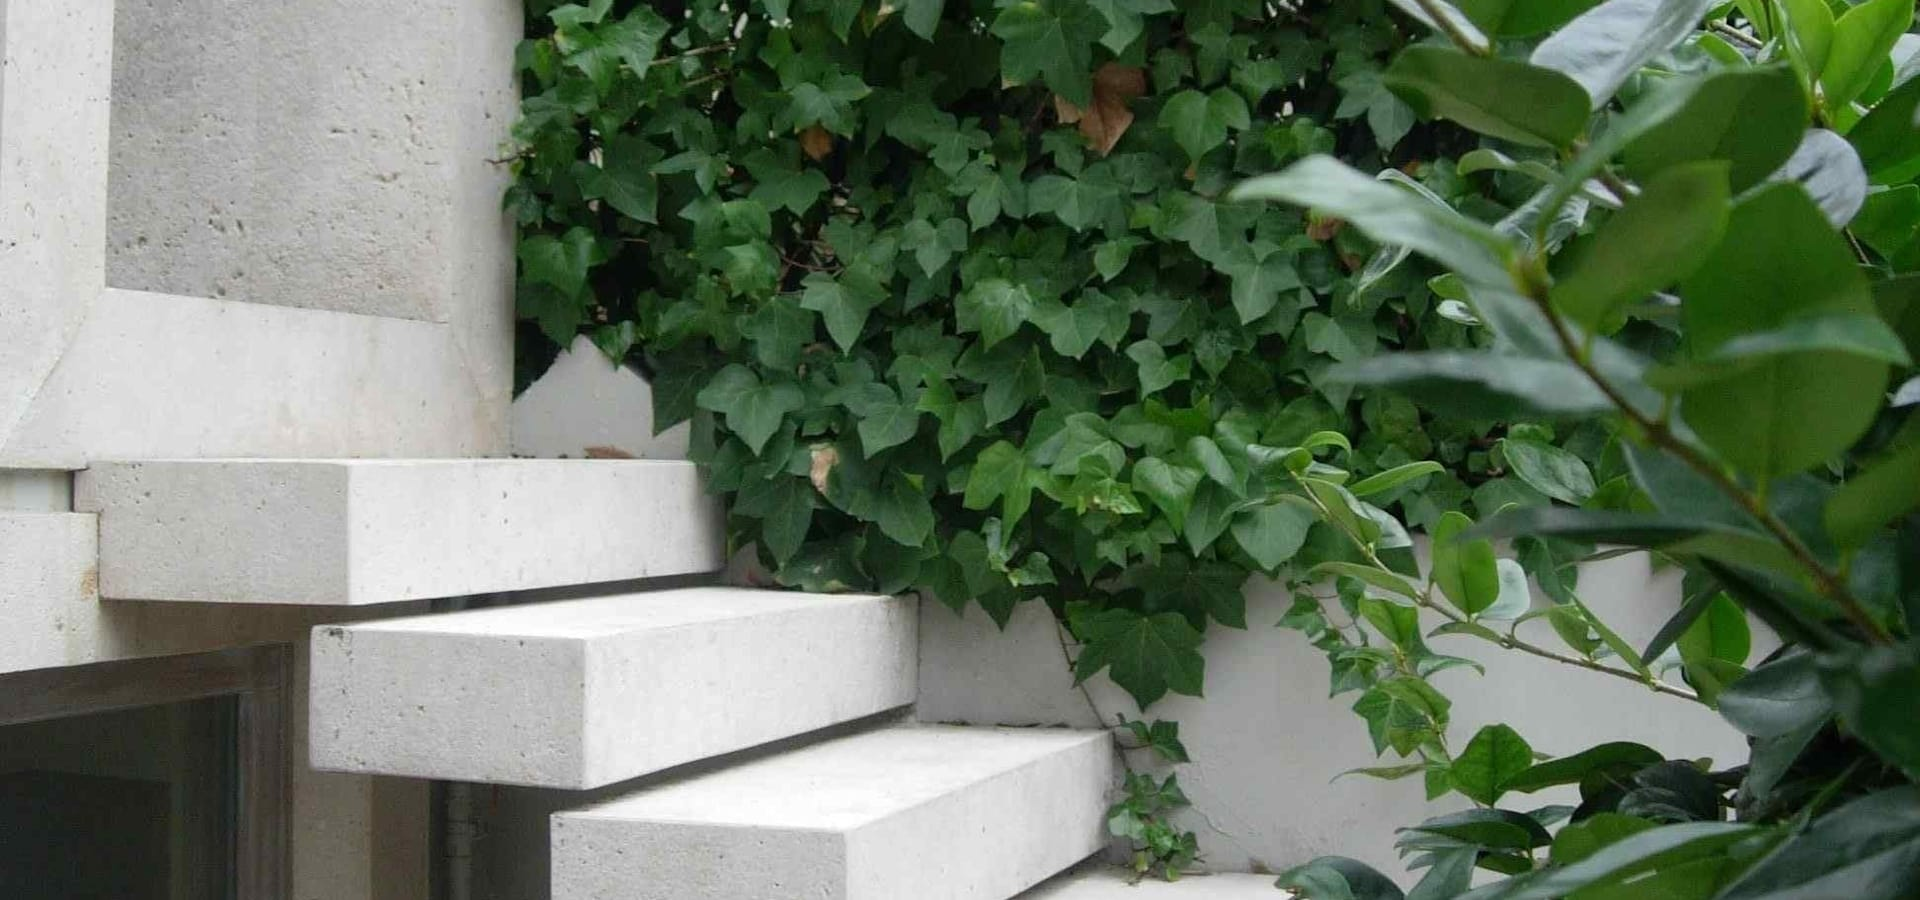 Estepa proyectos estudio de interiorismo arquitectos de interiores en madrid homify - Arquitecto de interiores madrid ...